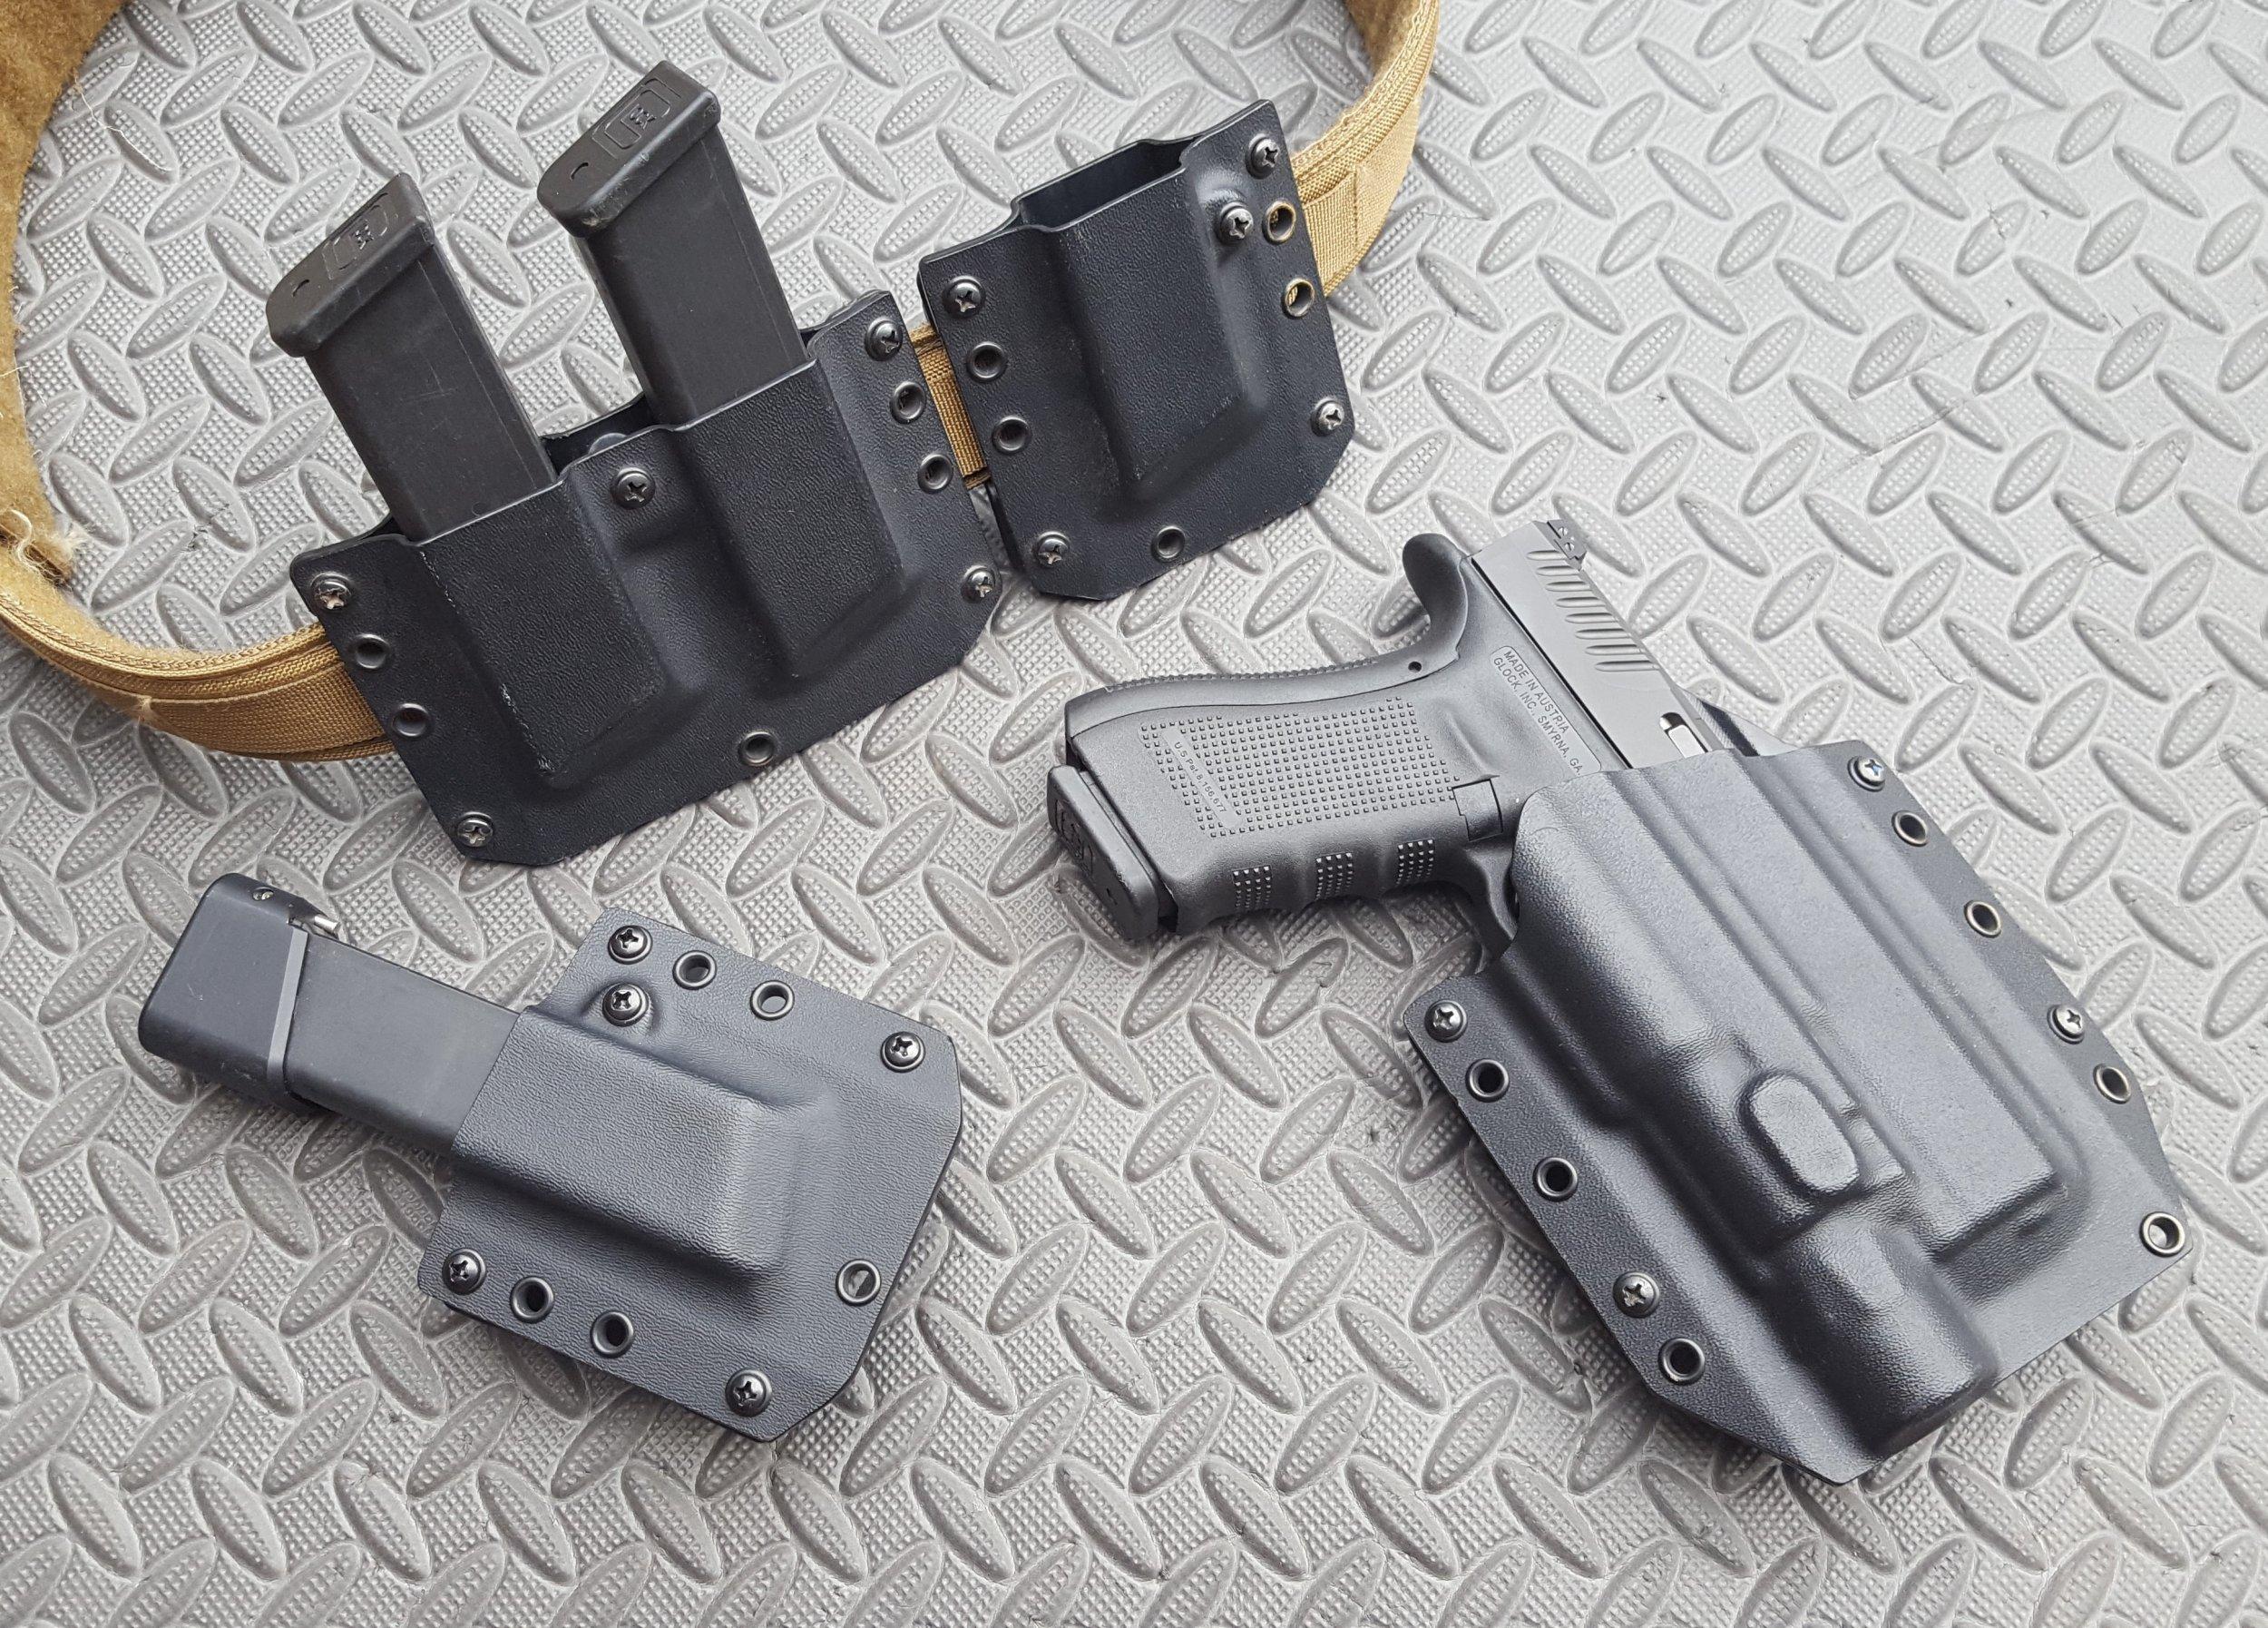 Bravo Concealment Bca Light Bearing Gun Holster And Mag